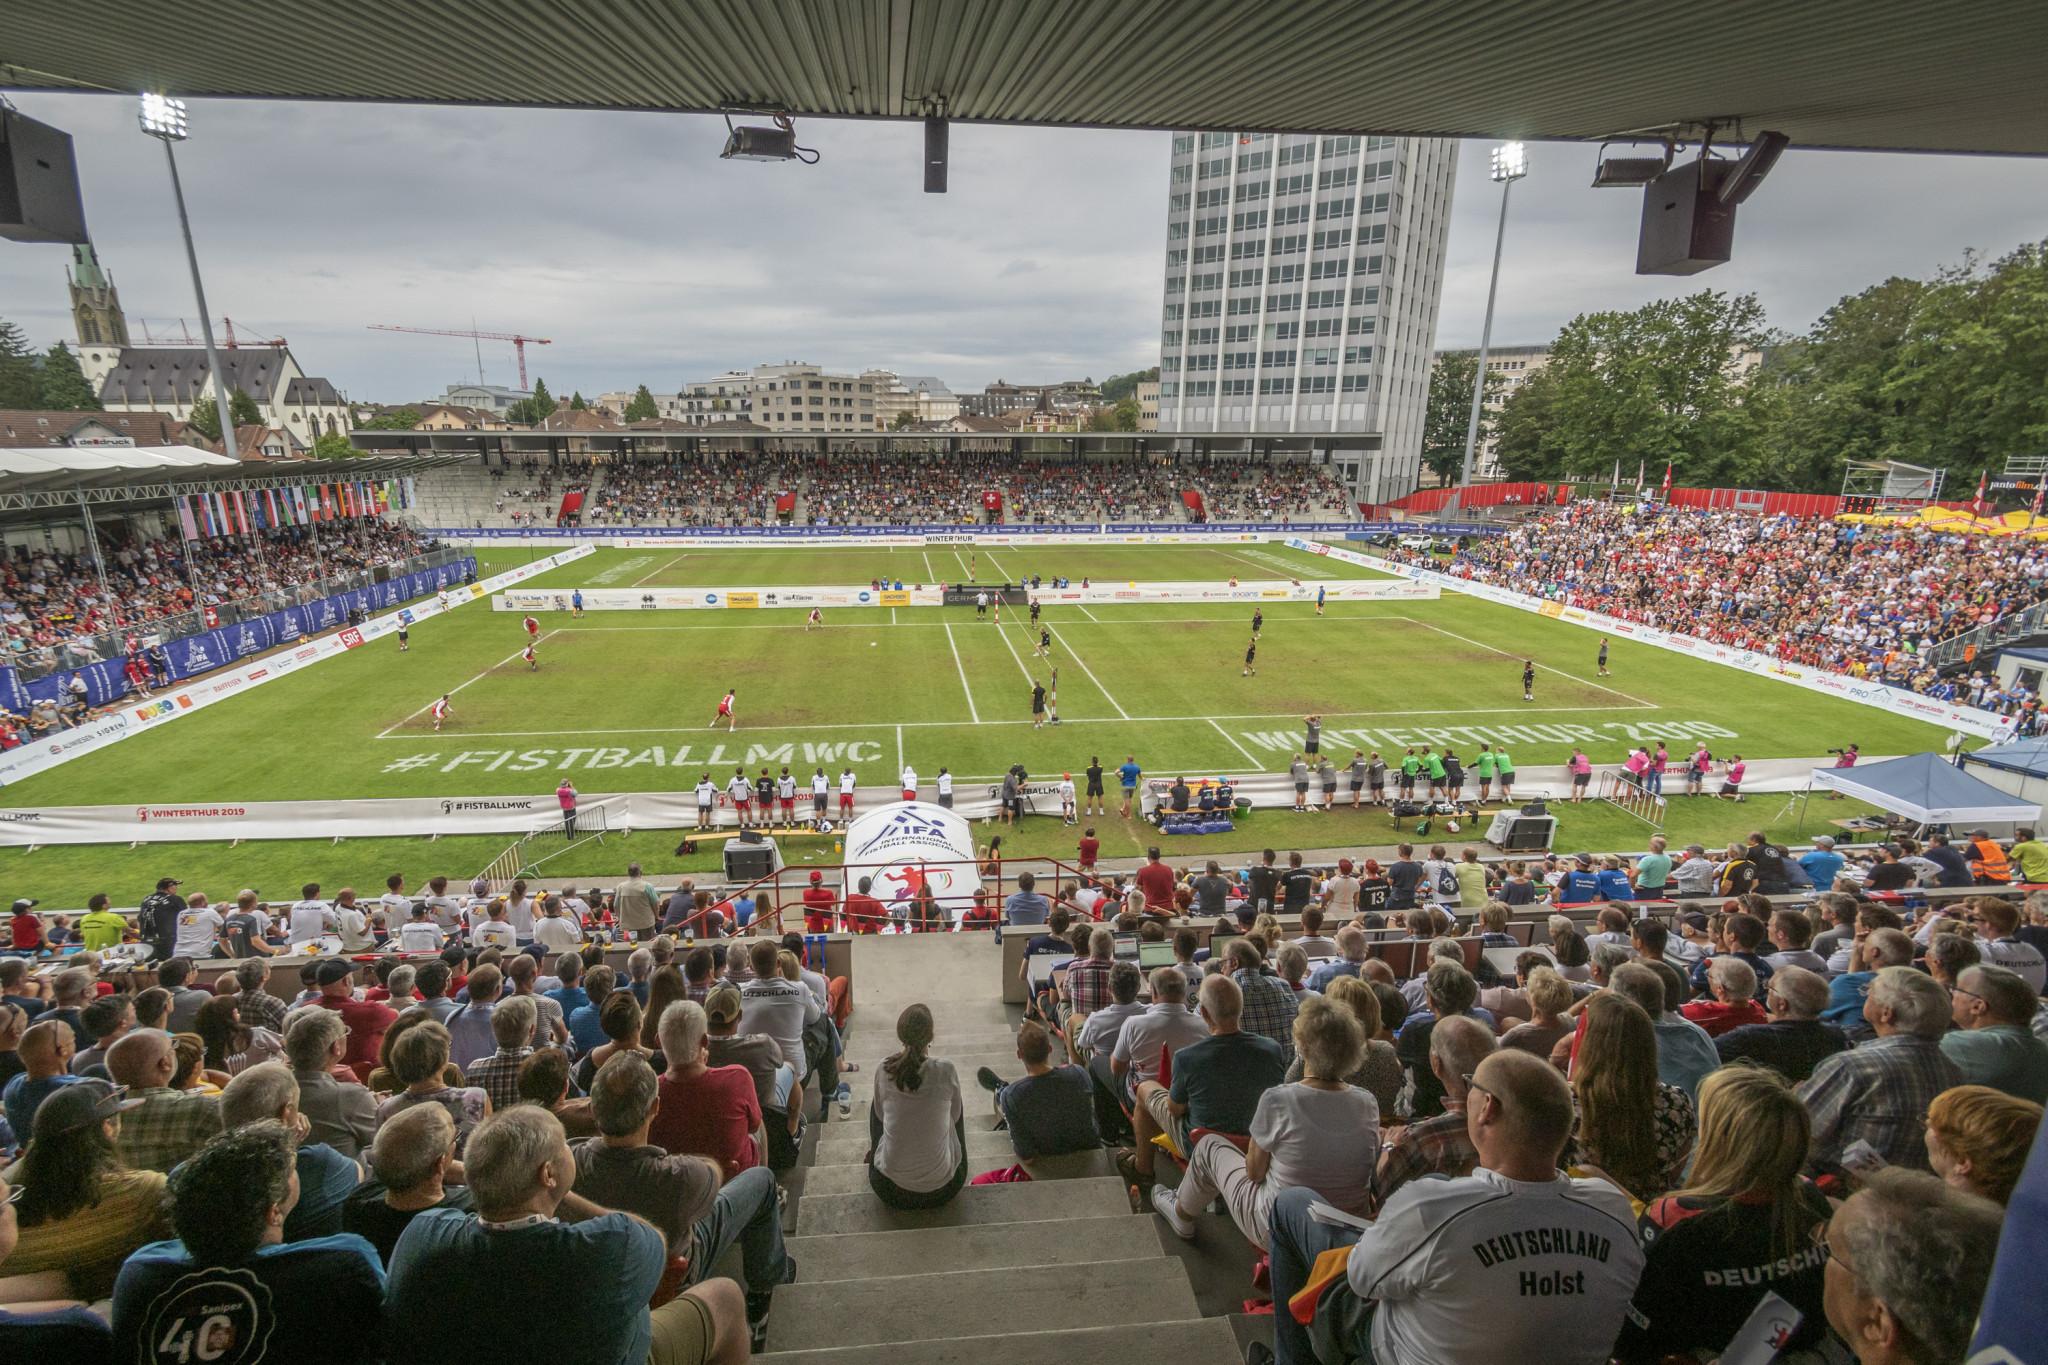 Nearly 90 million tune in to IFA Men's Fistball World Championship coverage